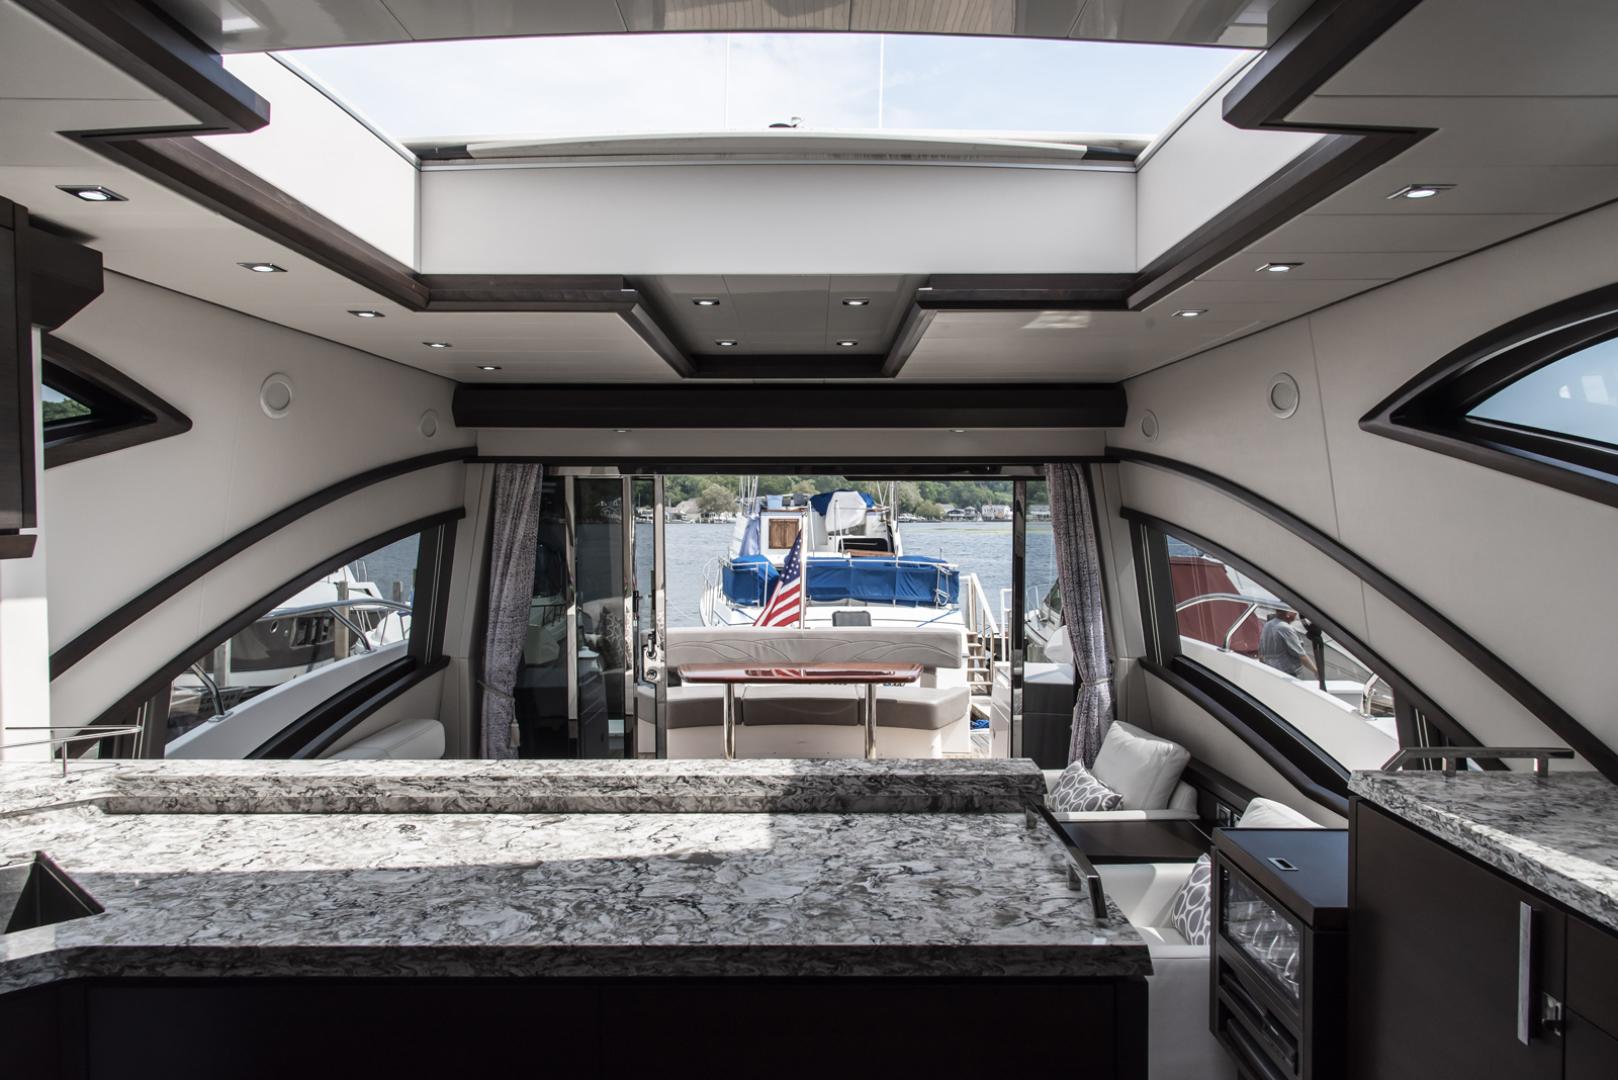 Neptunus-Motor Yacht Express 2018-LIQUID WISDOM Grand Haven-Michigan-United States-Salon looking aft-1484962 | Thumbnail